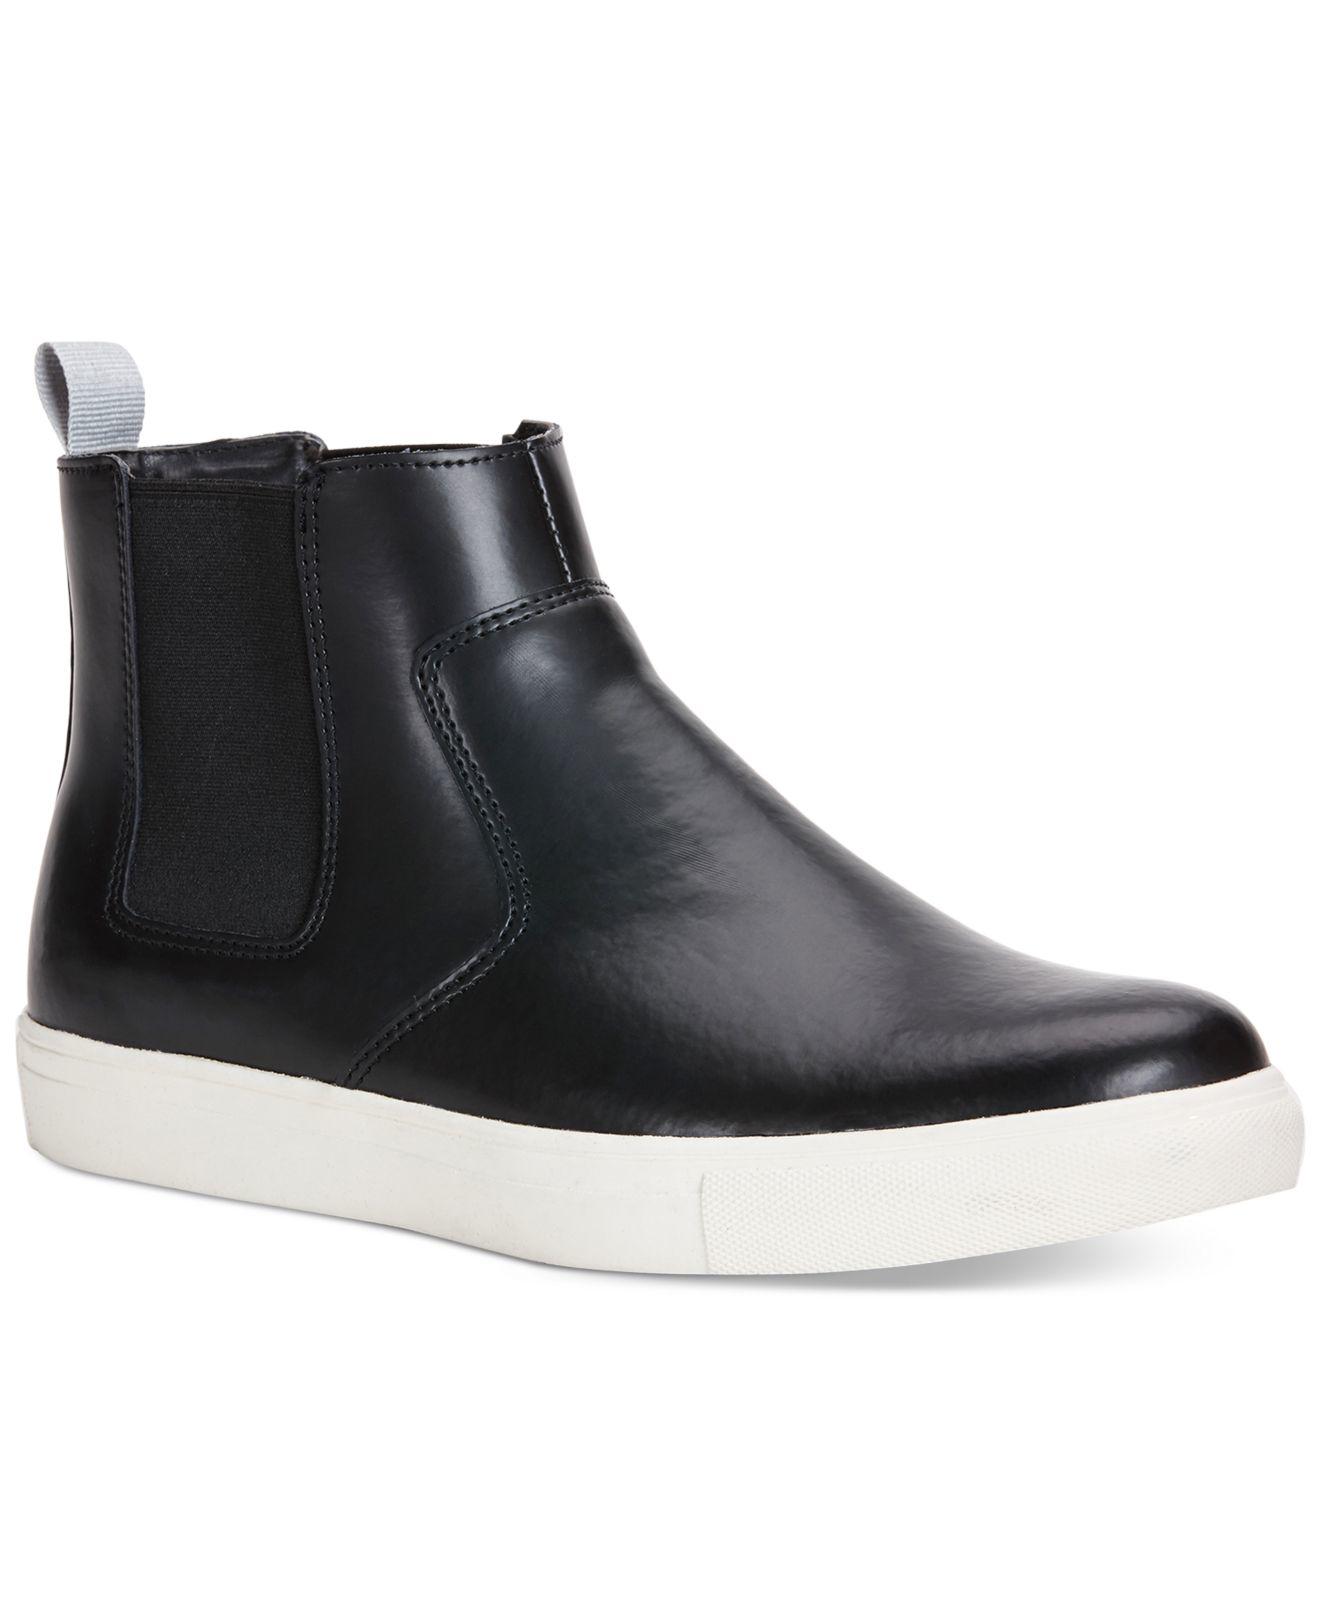 lyst calvin klein jeans casen chelsea pull on hi tops in black for men. Black Bedroom Furniture Sets. Home Design Ideas